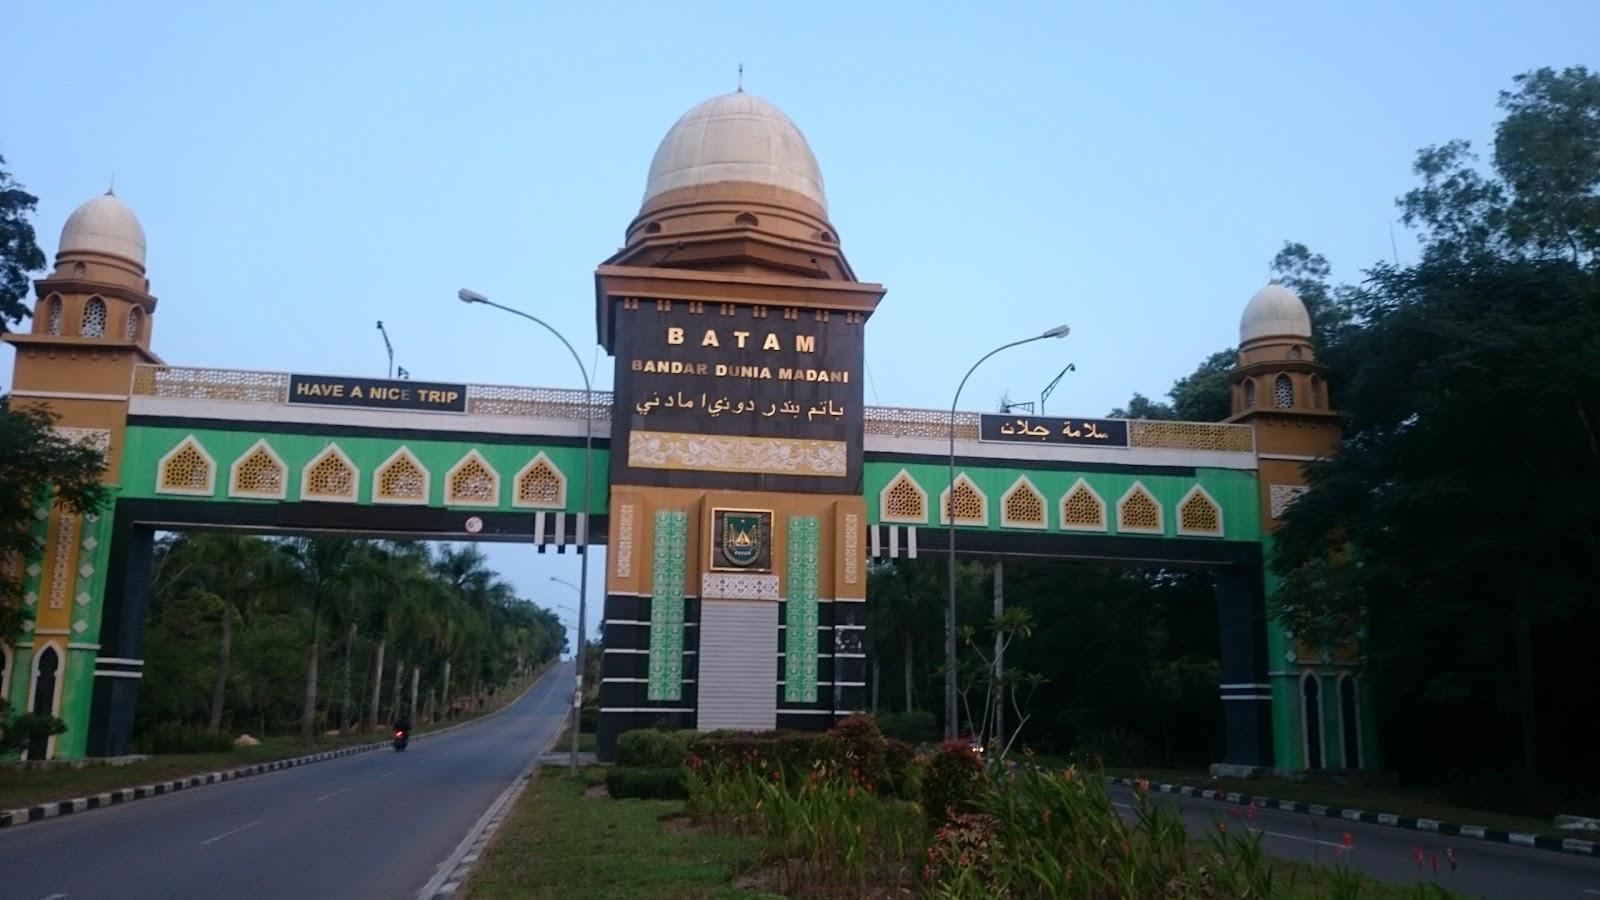 Hang Nadim Batam: A Beautiful International Airport with The Longest Runway in Indonesia